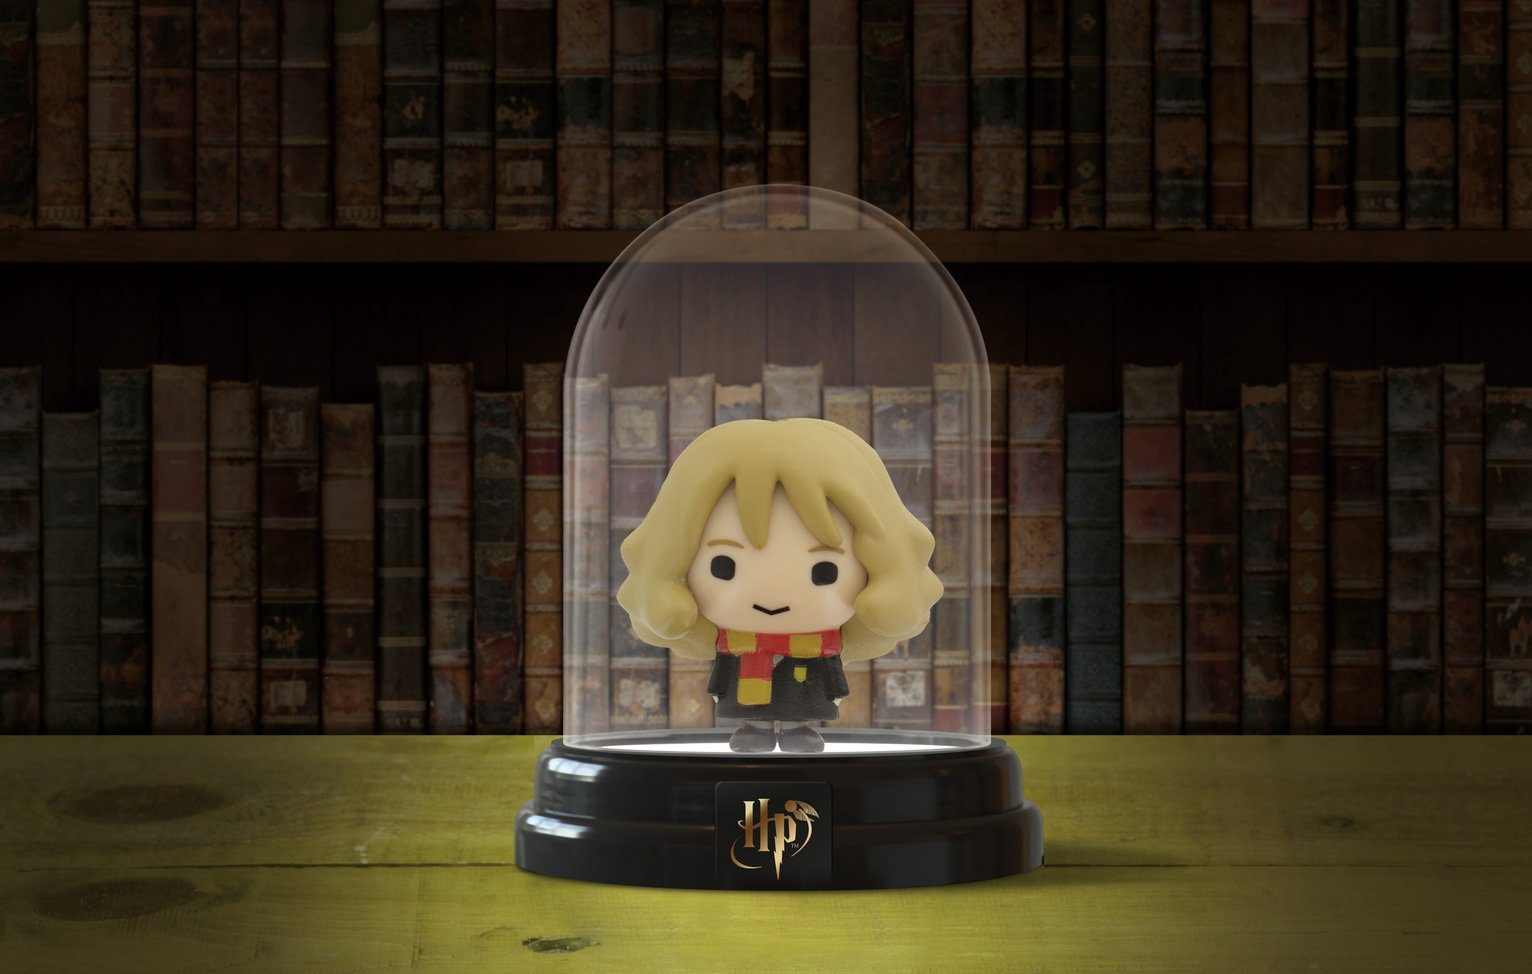 Harry Potter Hermione Mini Bell Jar Light